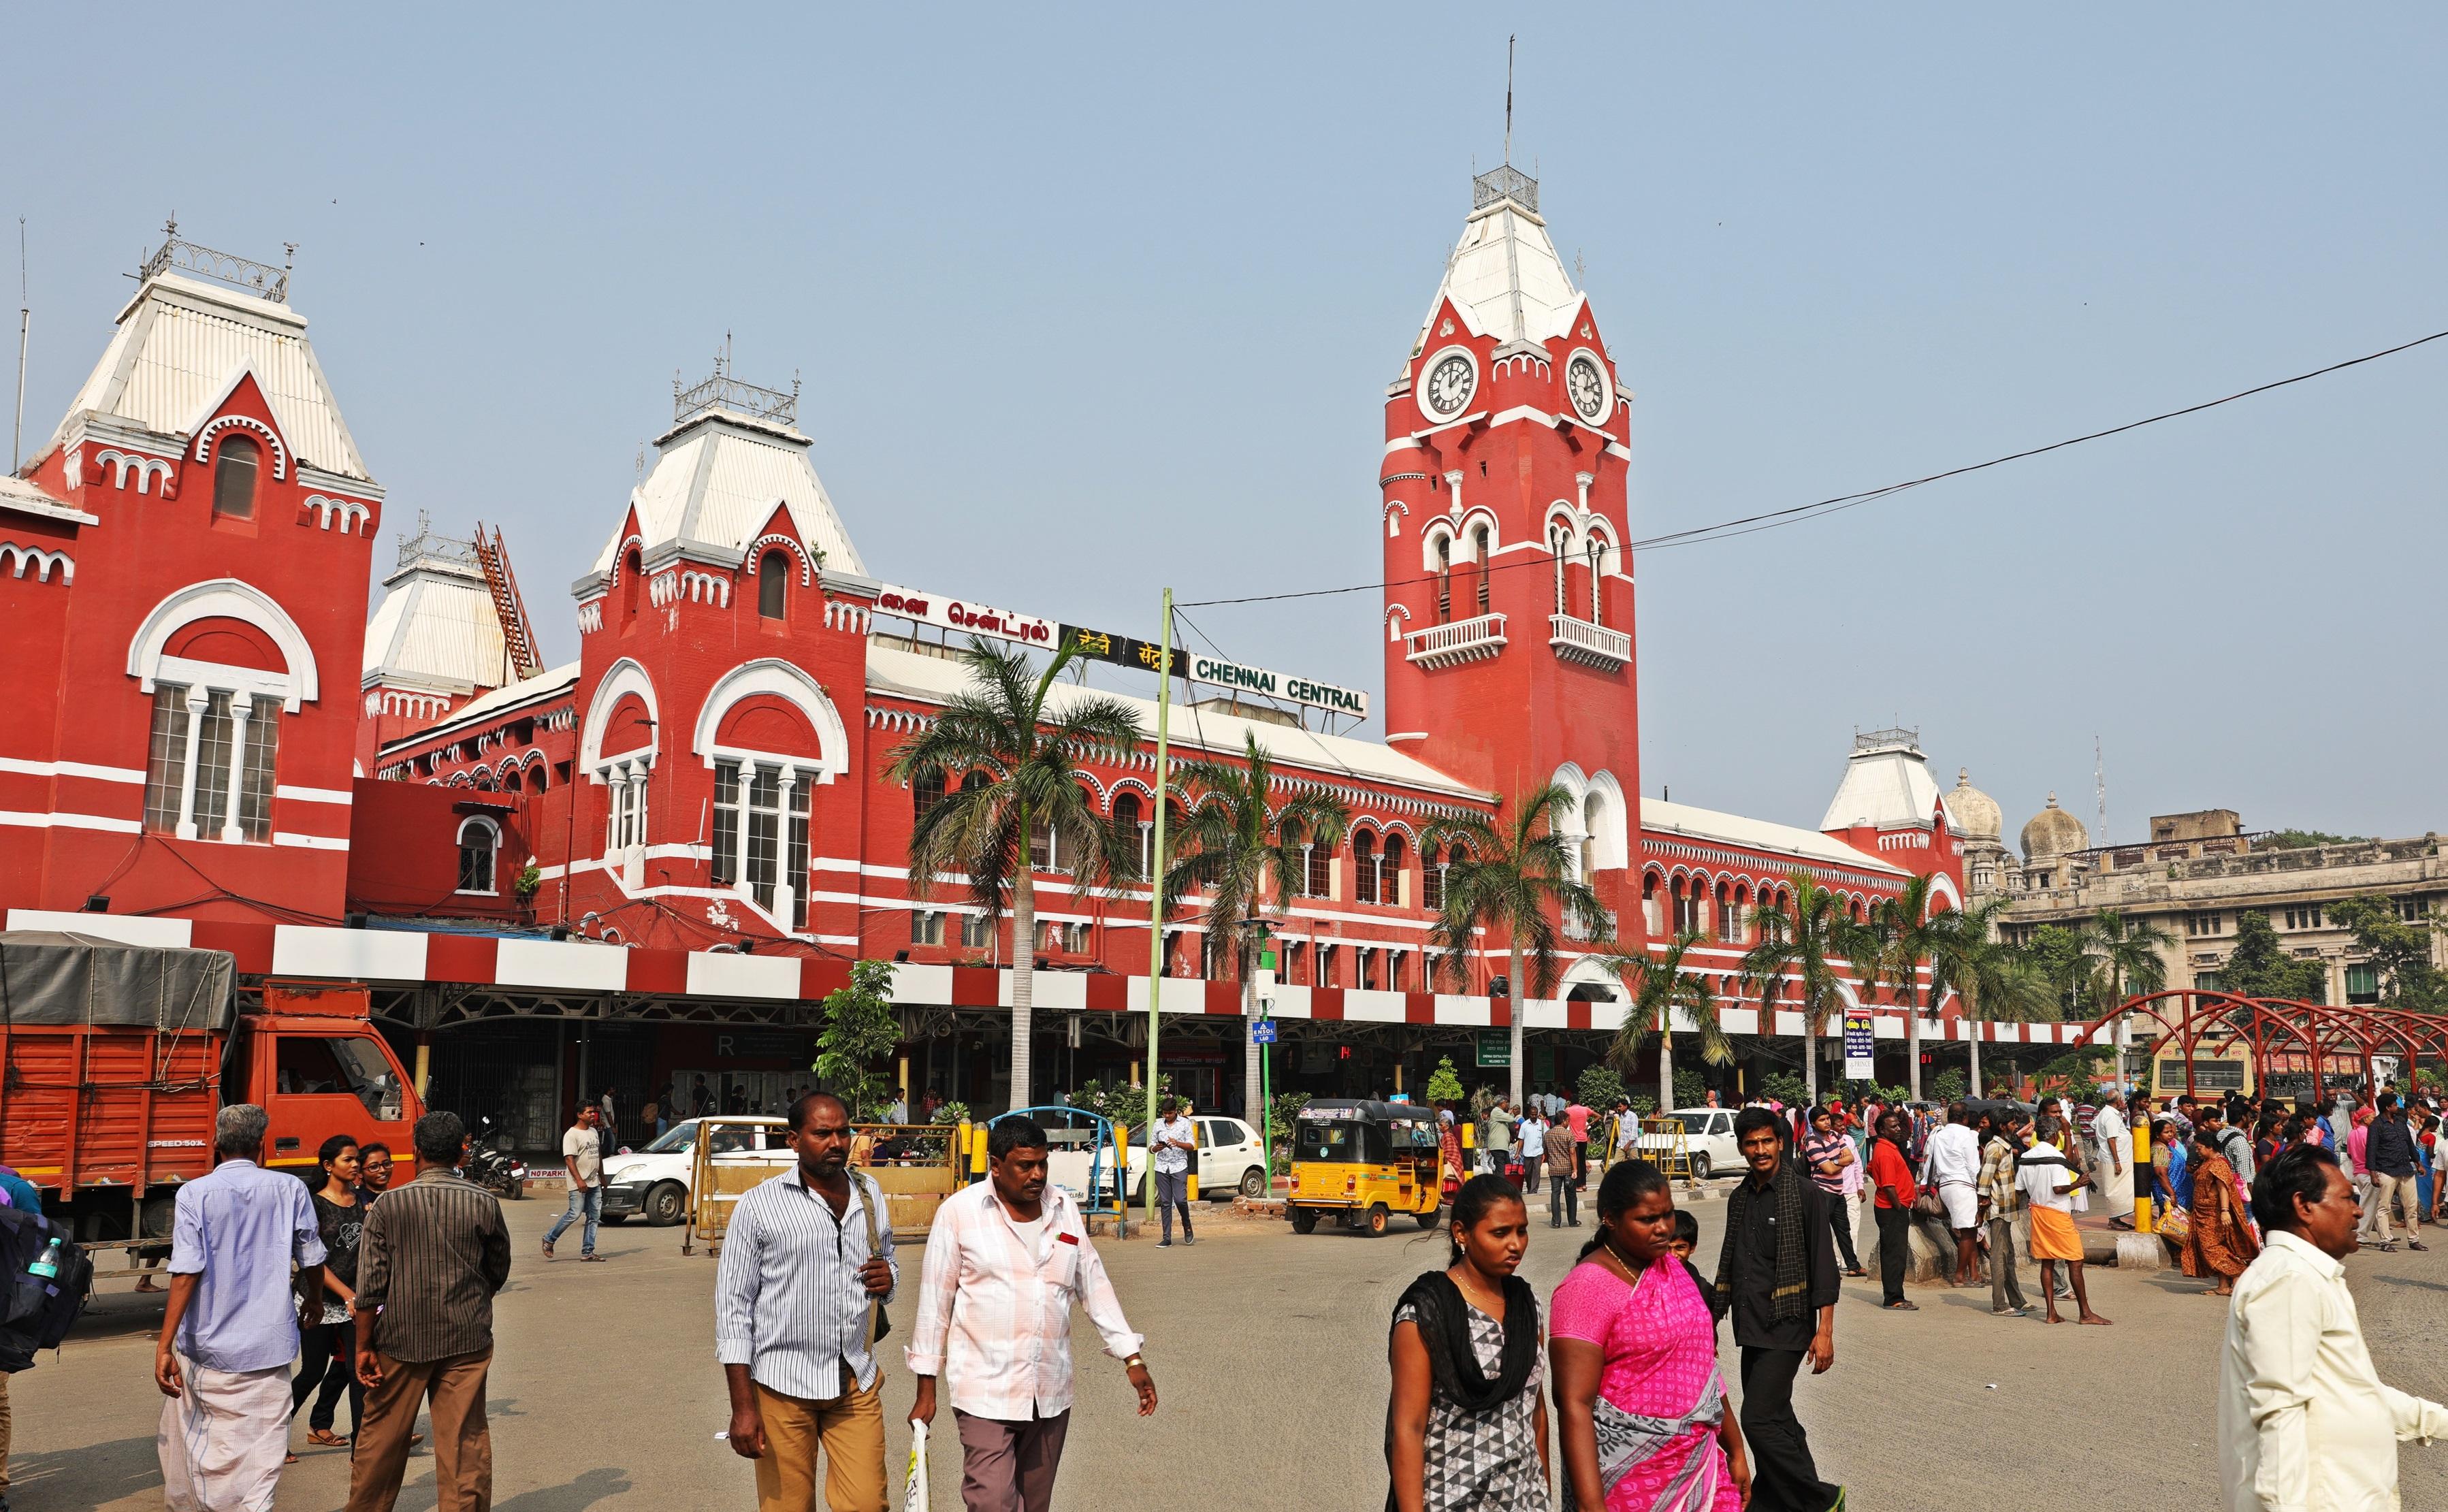 Central Railway Station, Chennai